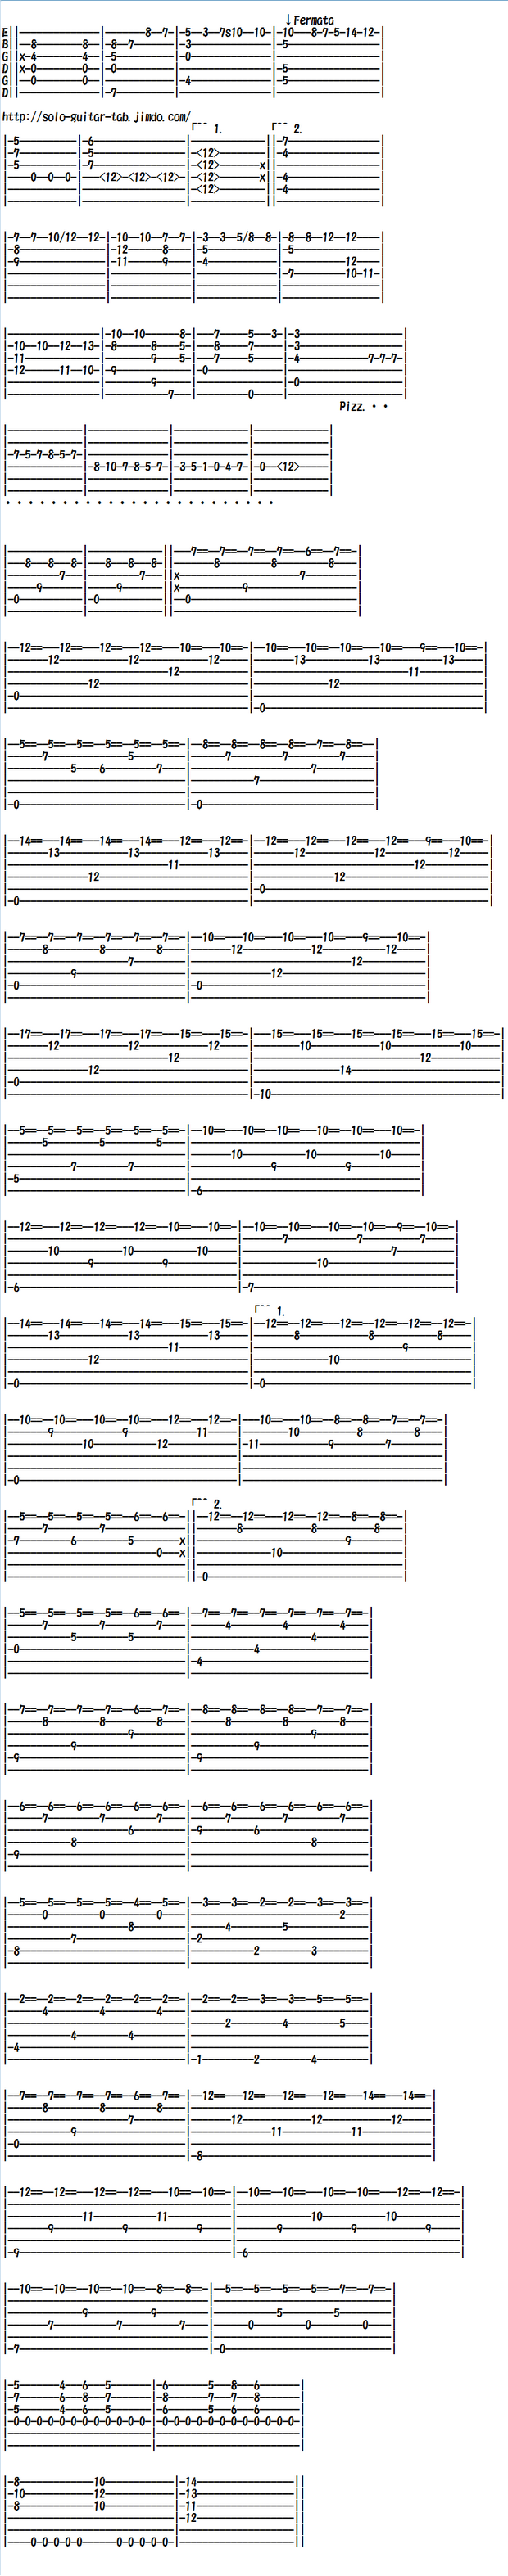 Hardest Classical Guitar Sheet Music (Tabs), Un Sueno en la Floresta